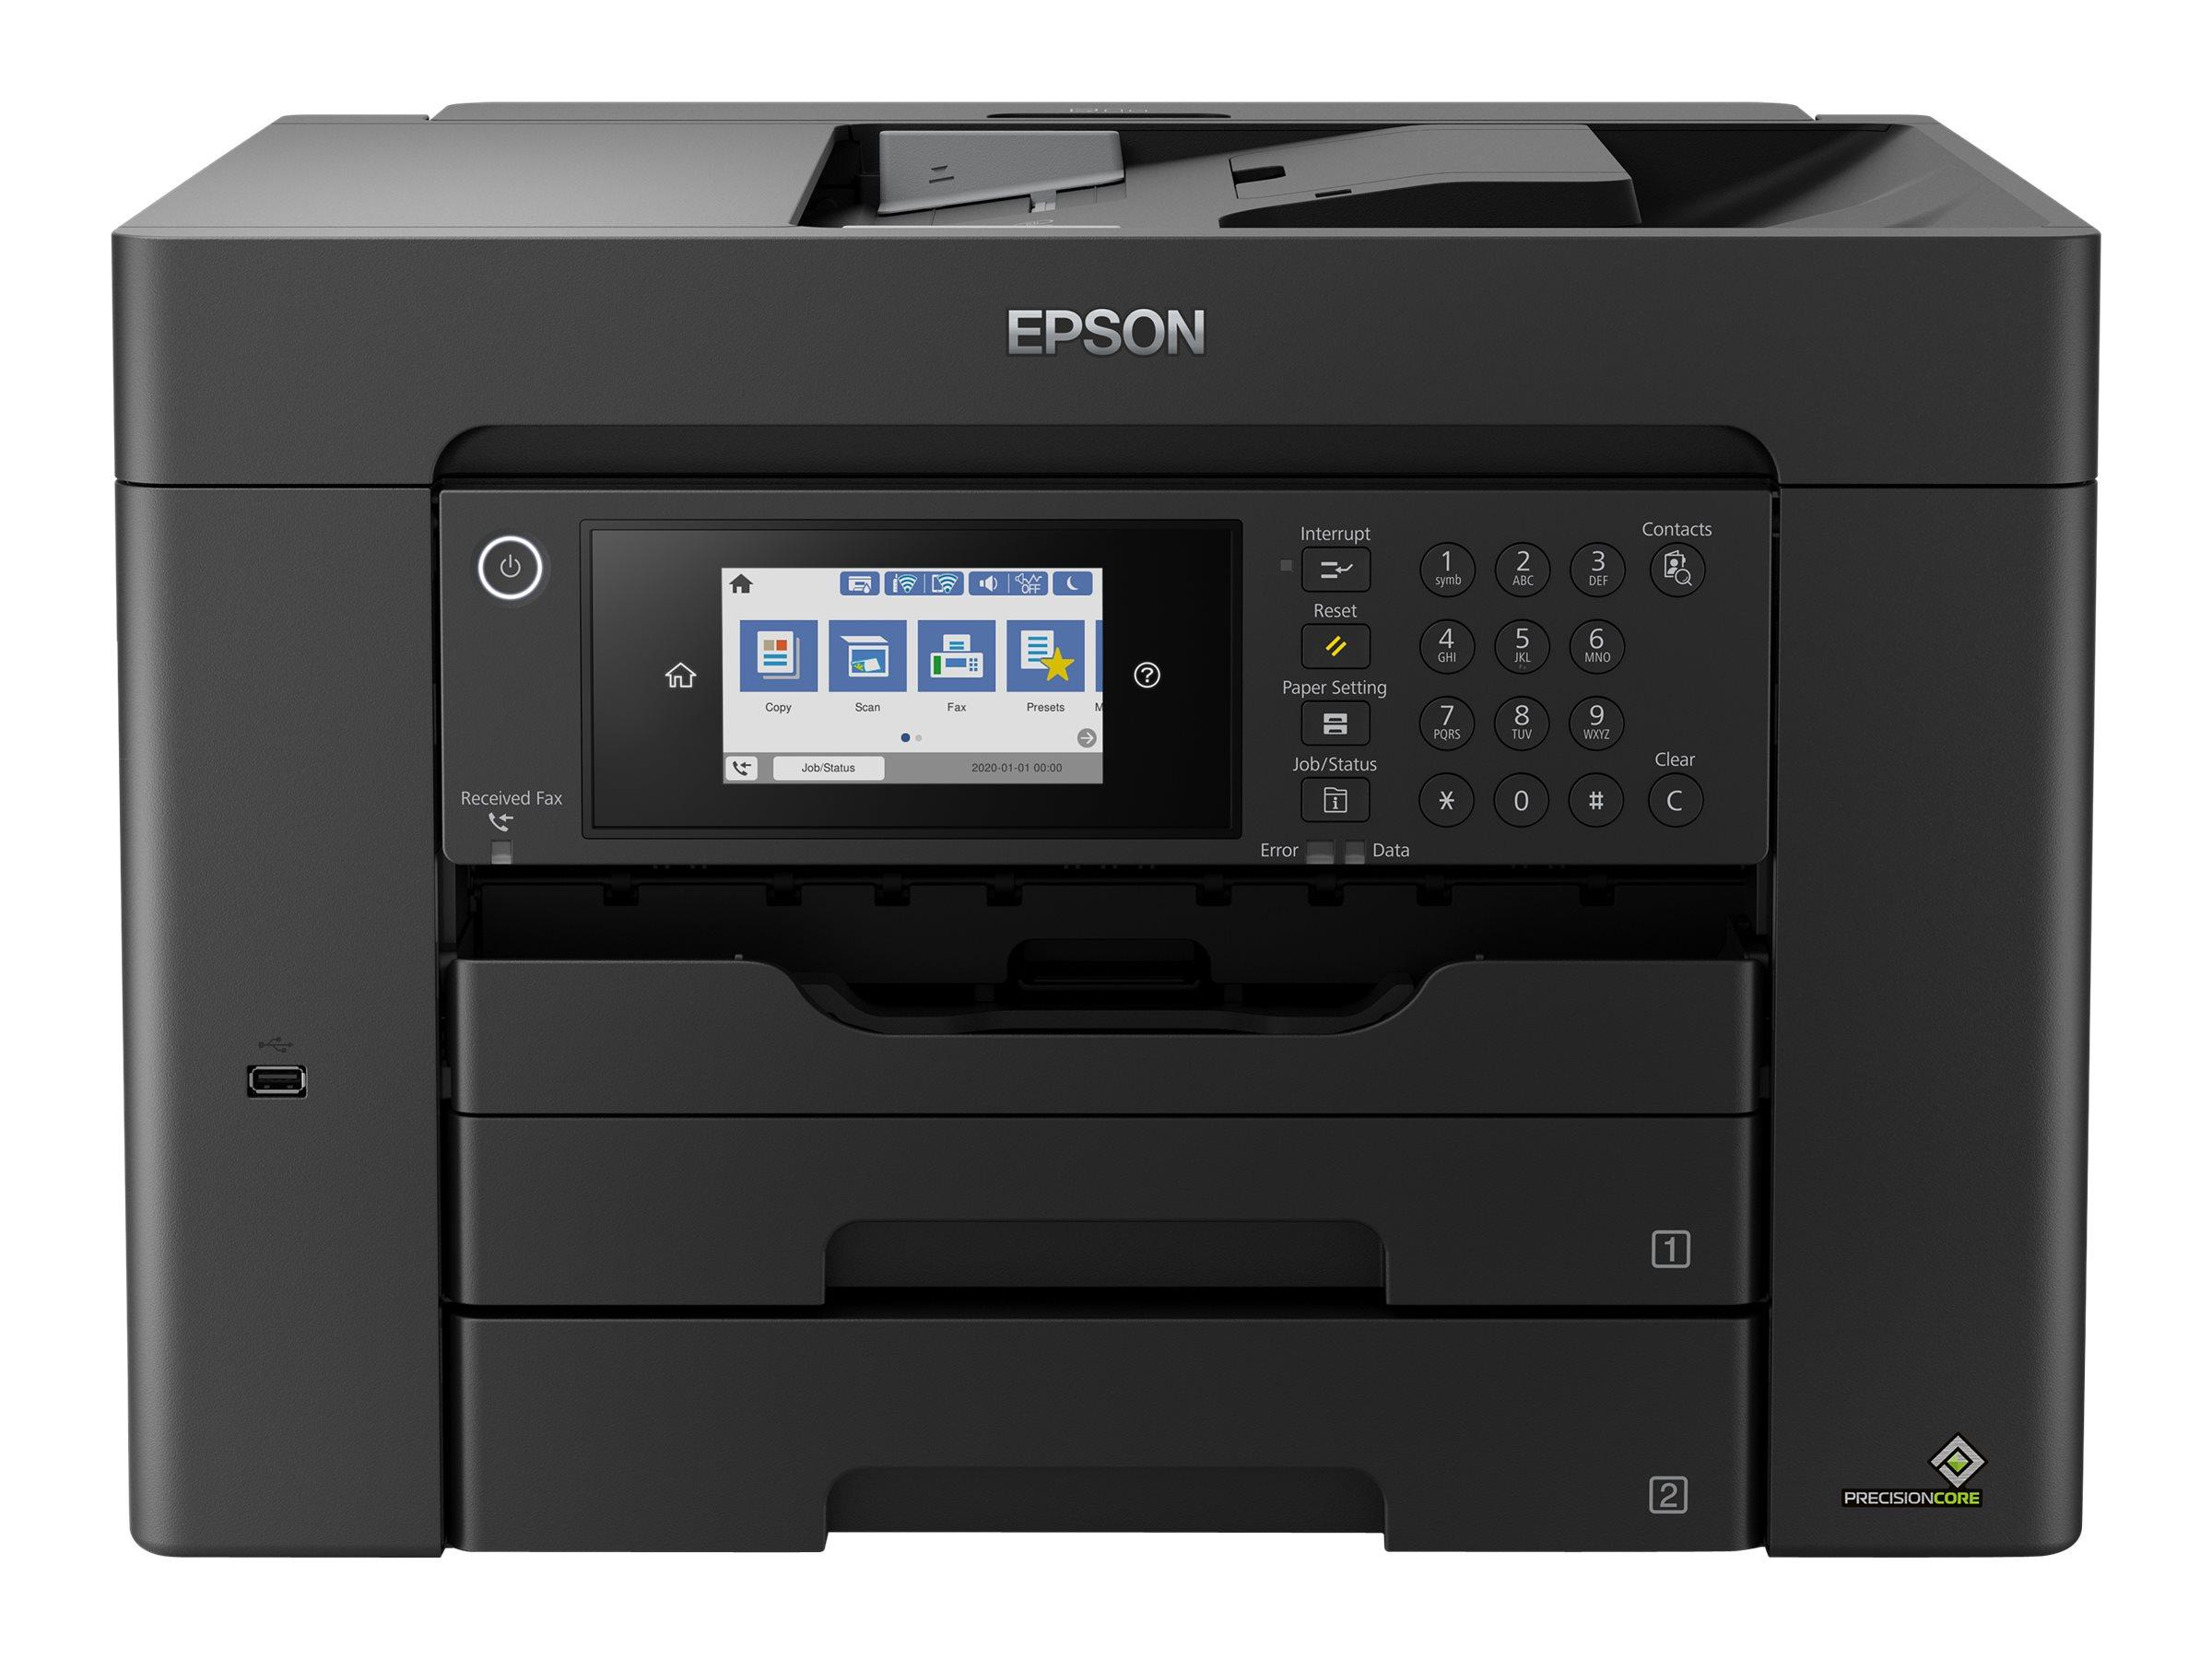 Epson WorkForce WF-7840DTWF - Multifunktionsdrucker - Farbe - Tintenstrahl - A3 (297 x 420 mm) (Original) - A3 (Medien)